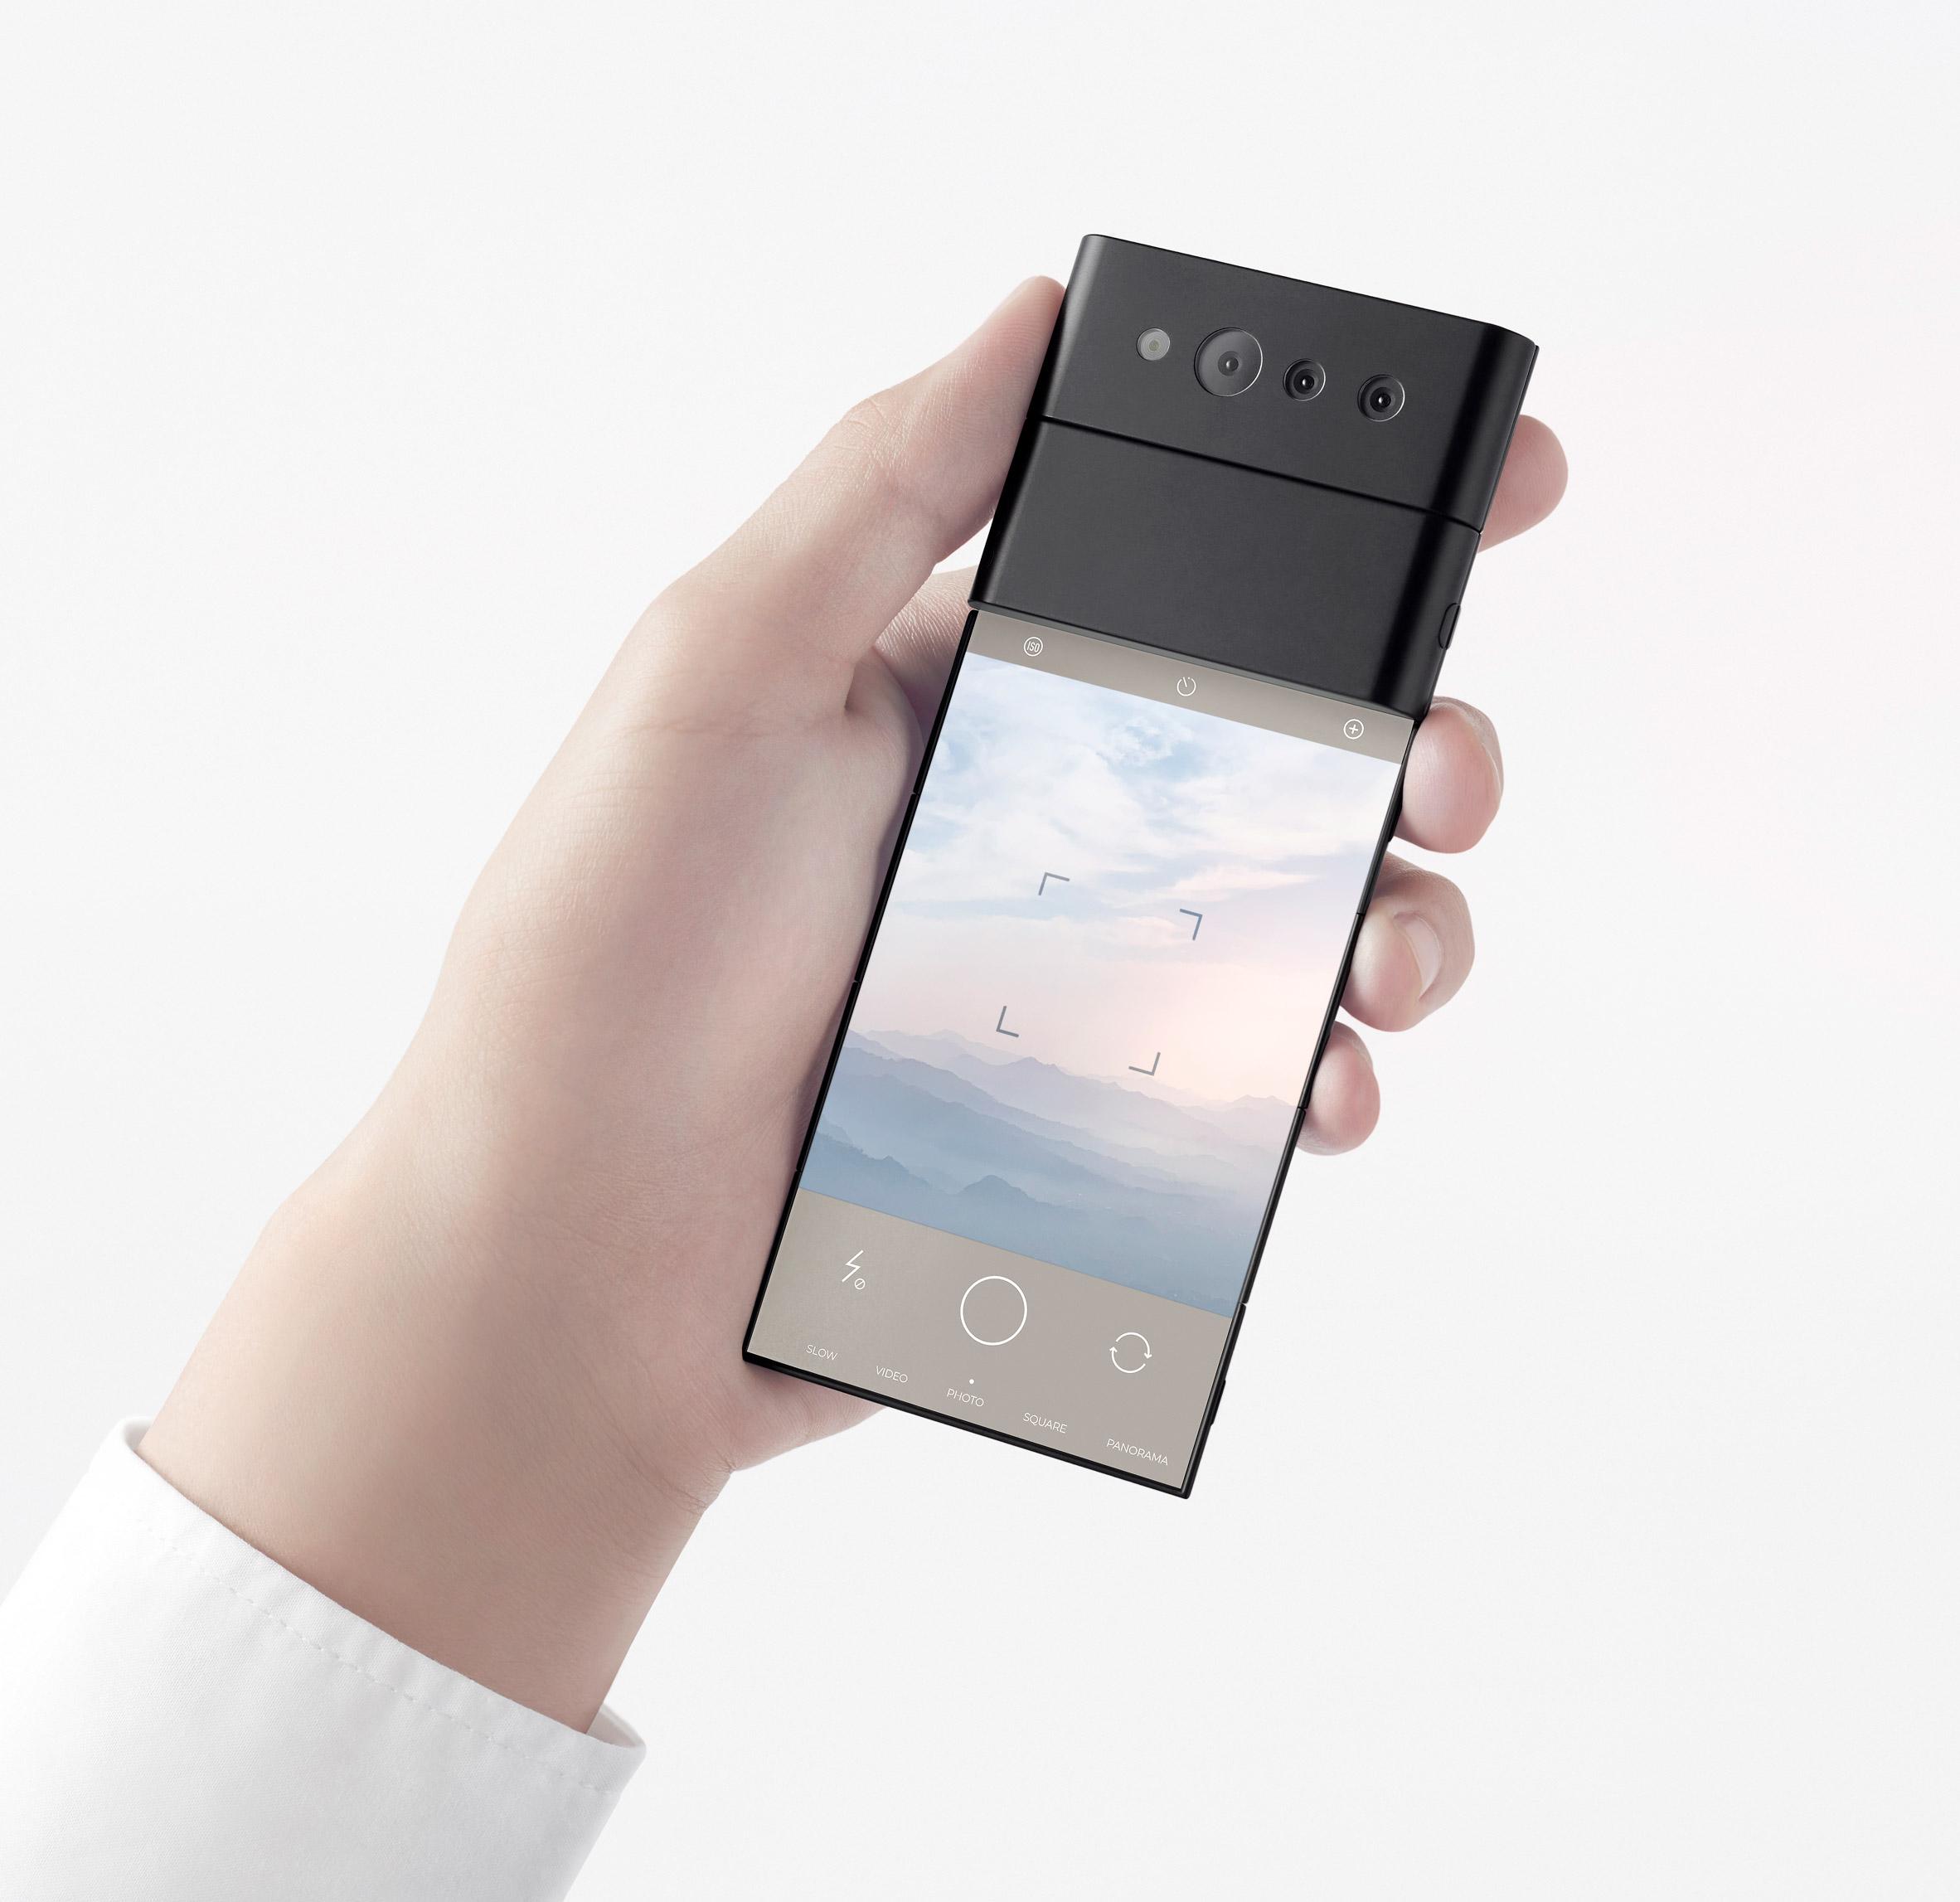 nendo-slide-phone-concept-design_dezeen_2364_col_6